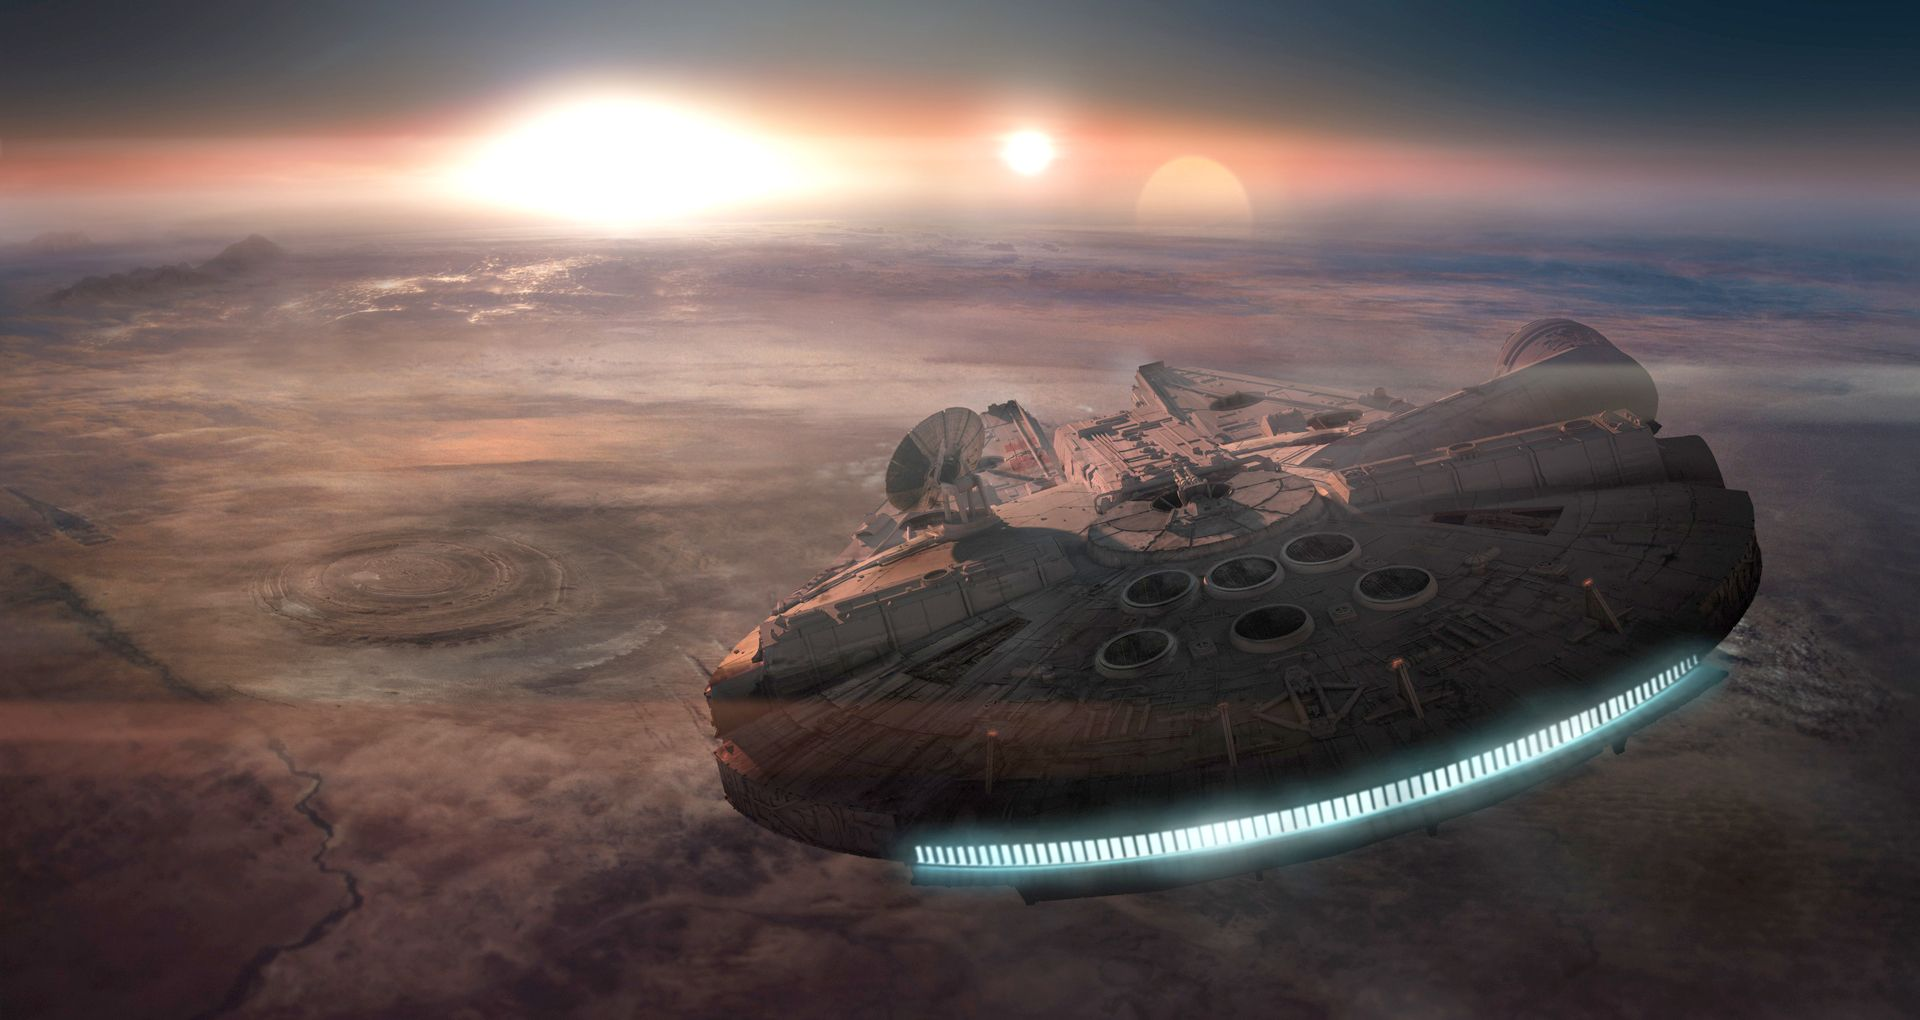 Millenium Falconhttps I Redd It 9dcjeyx0mvh21 Jpg Star Wars Wallpaper Star Wars Episode Vii Star Wars 7